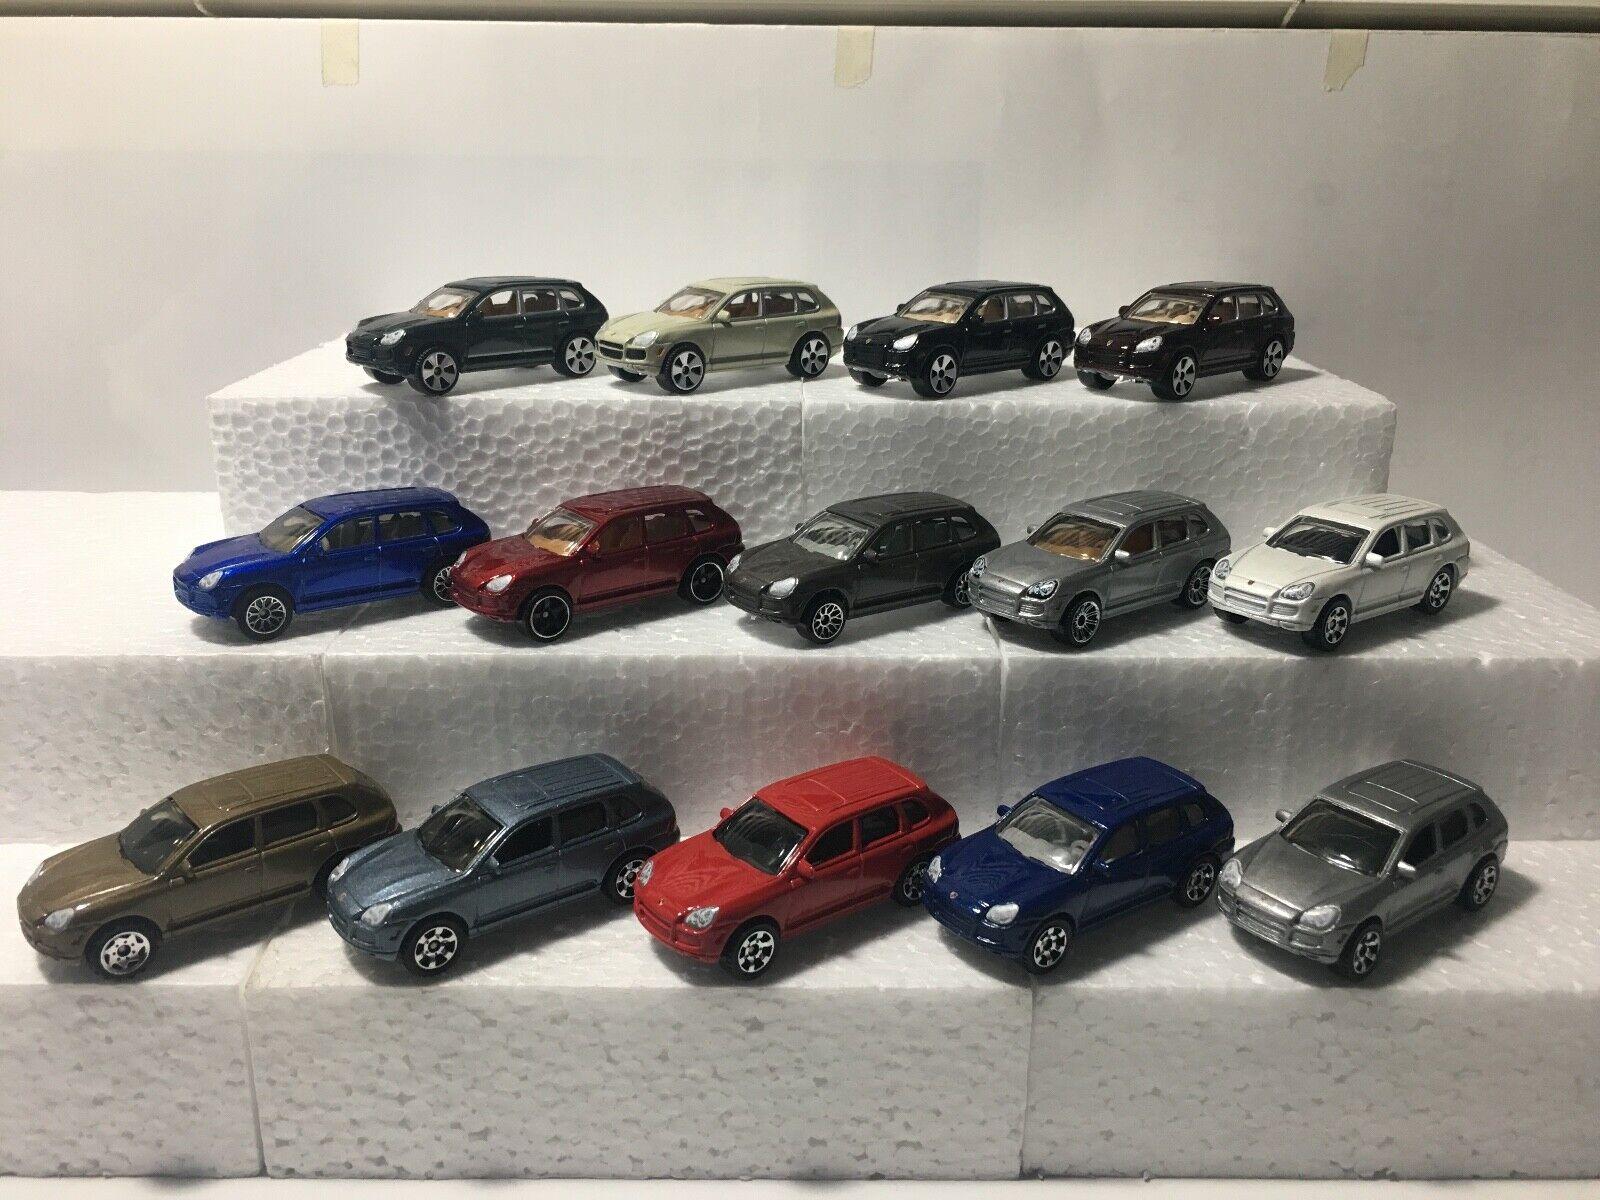 Matchbox Porsche Cayenne Turbo set of 14